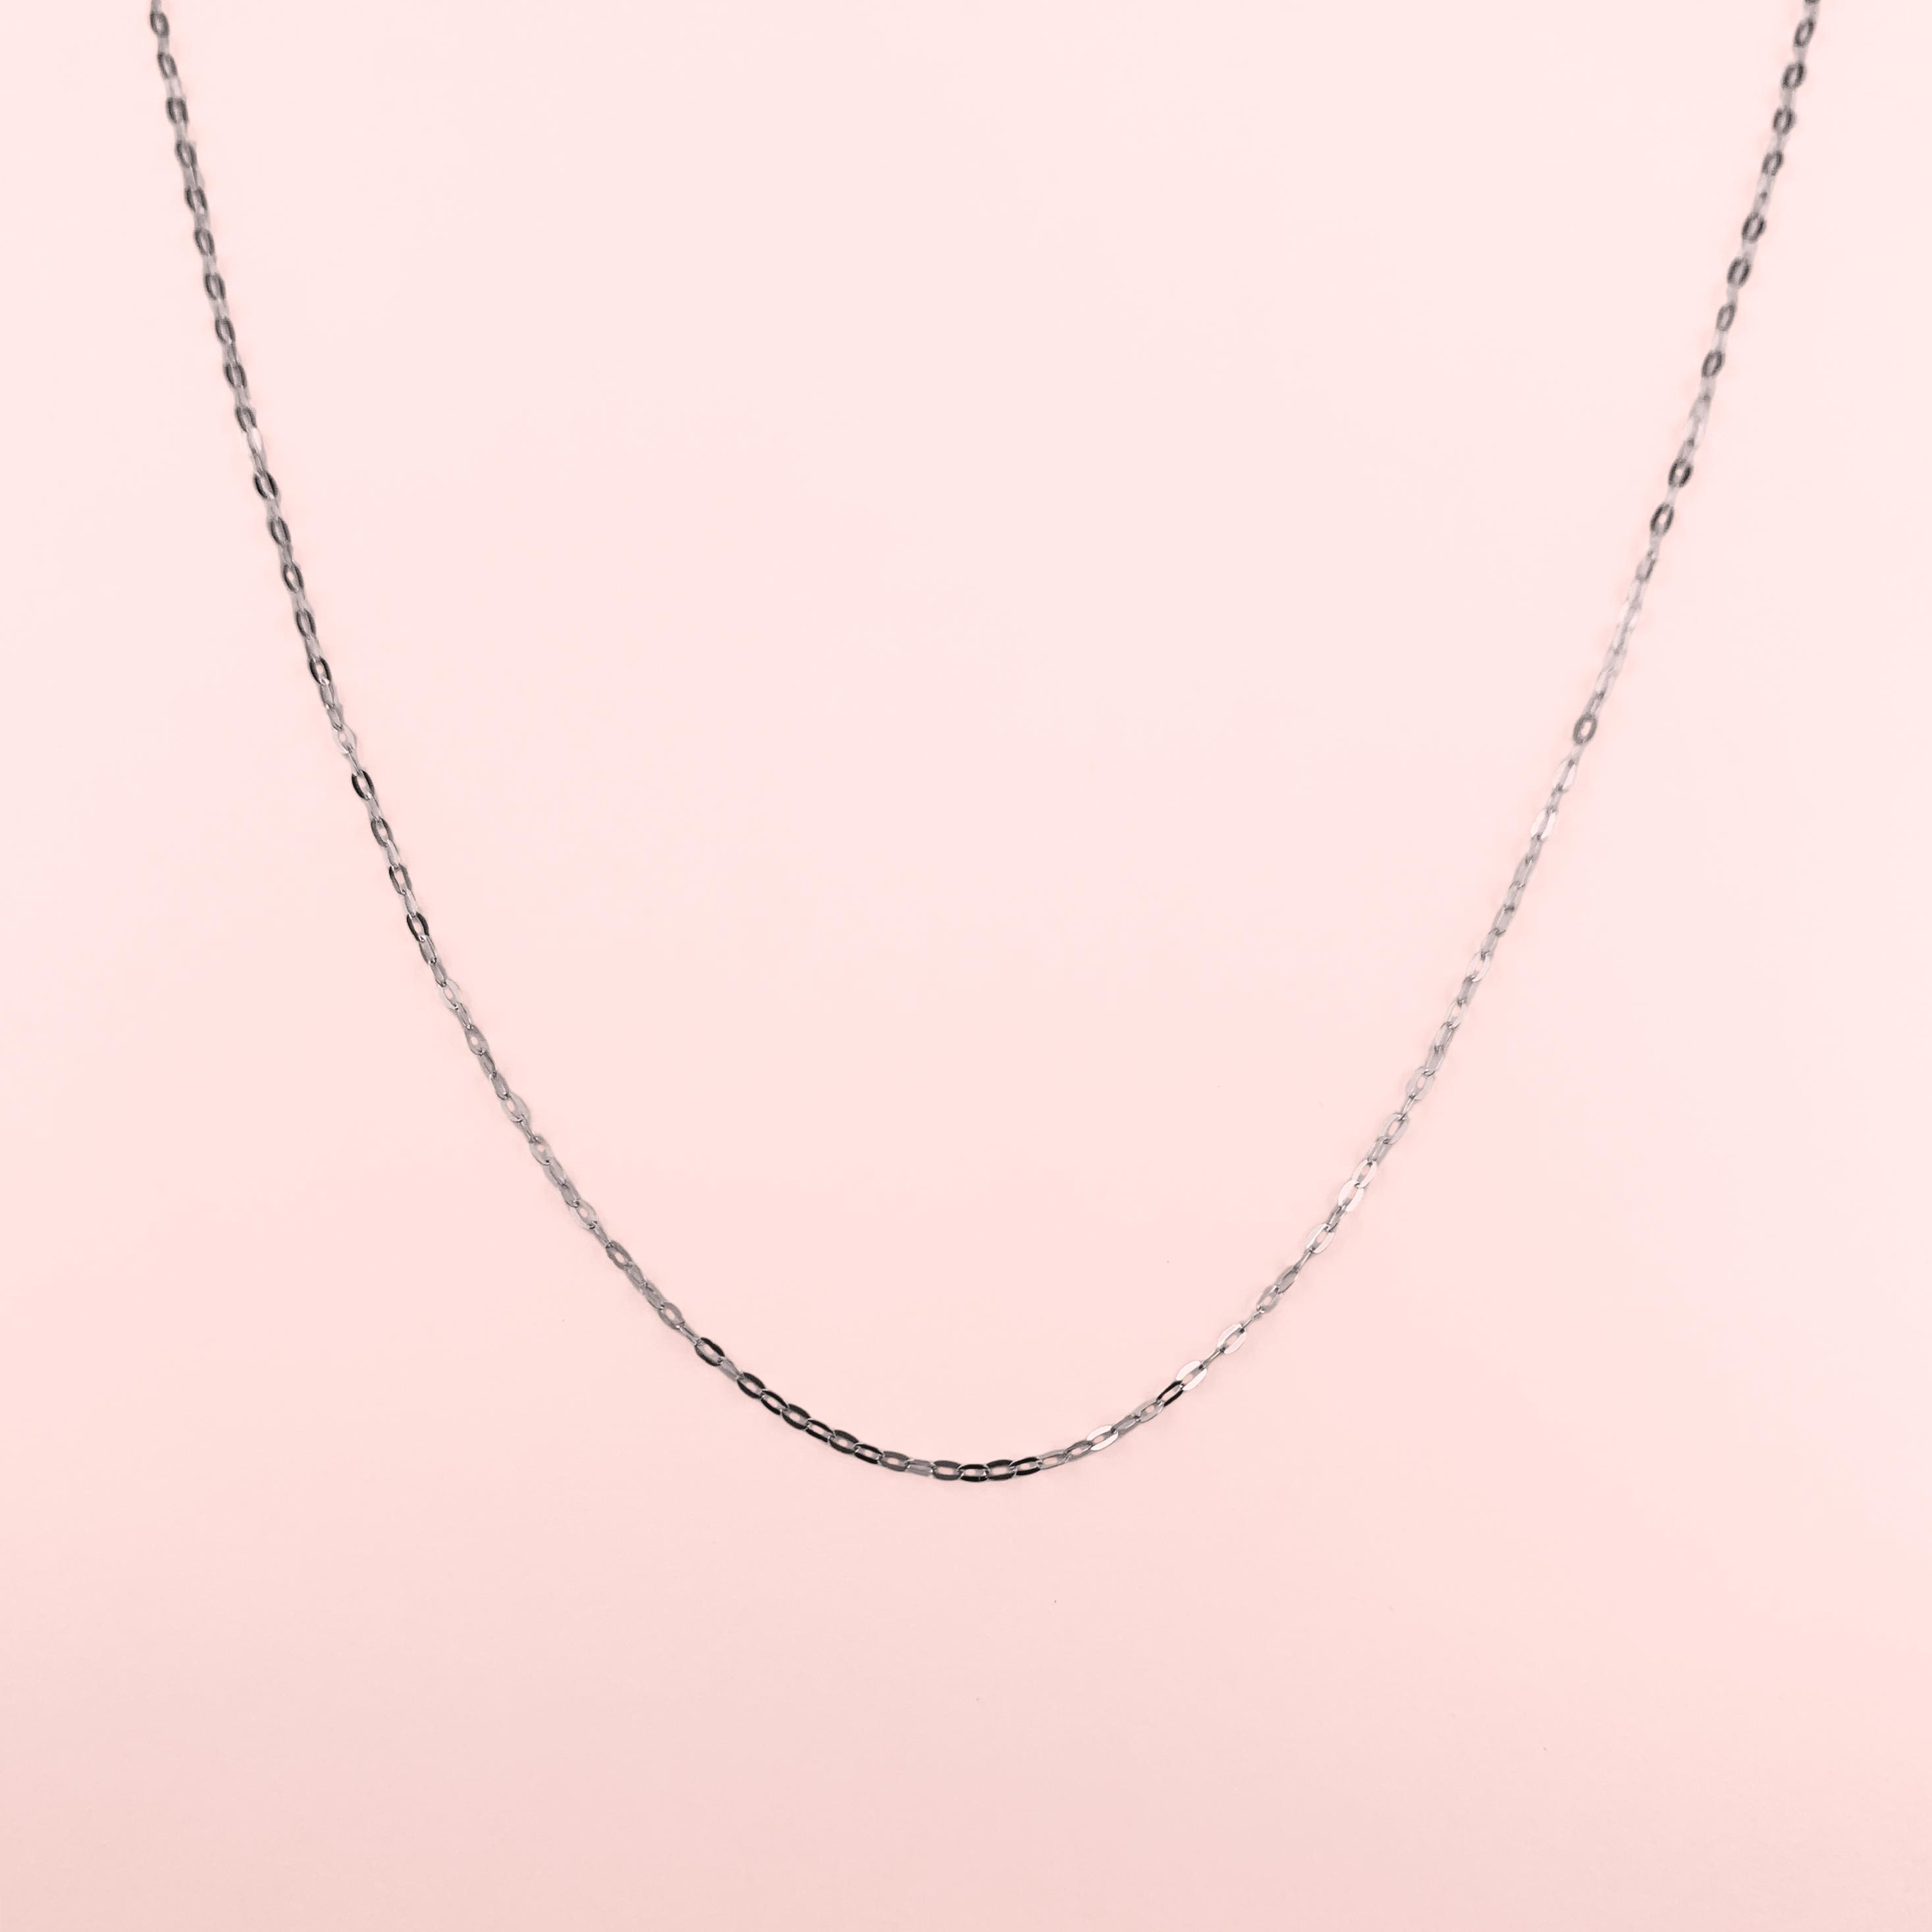 K18WG Necklace(45cm / アジャスター付き)